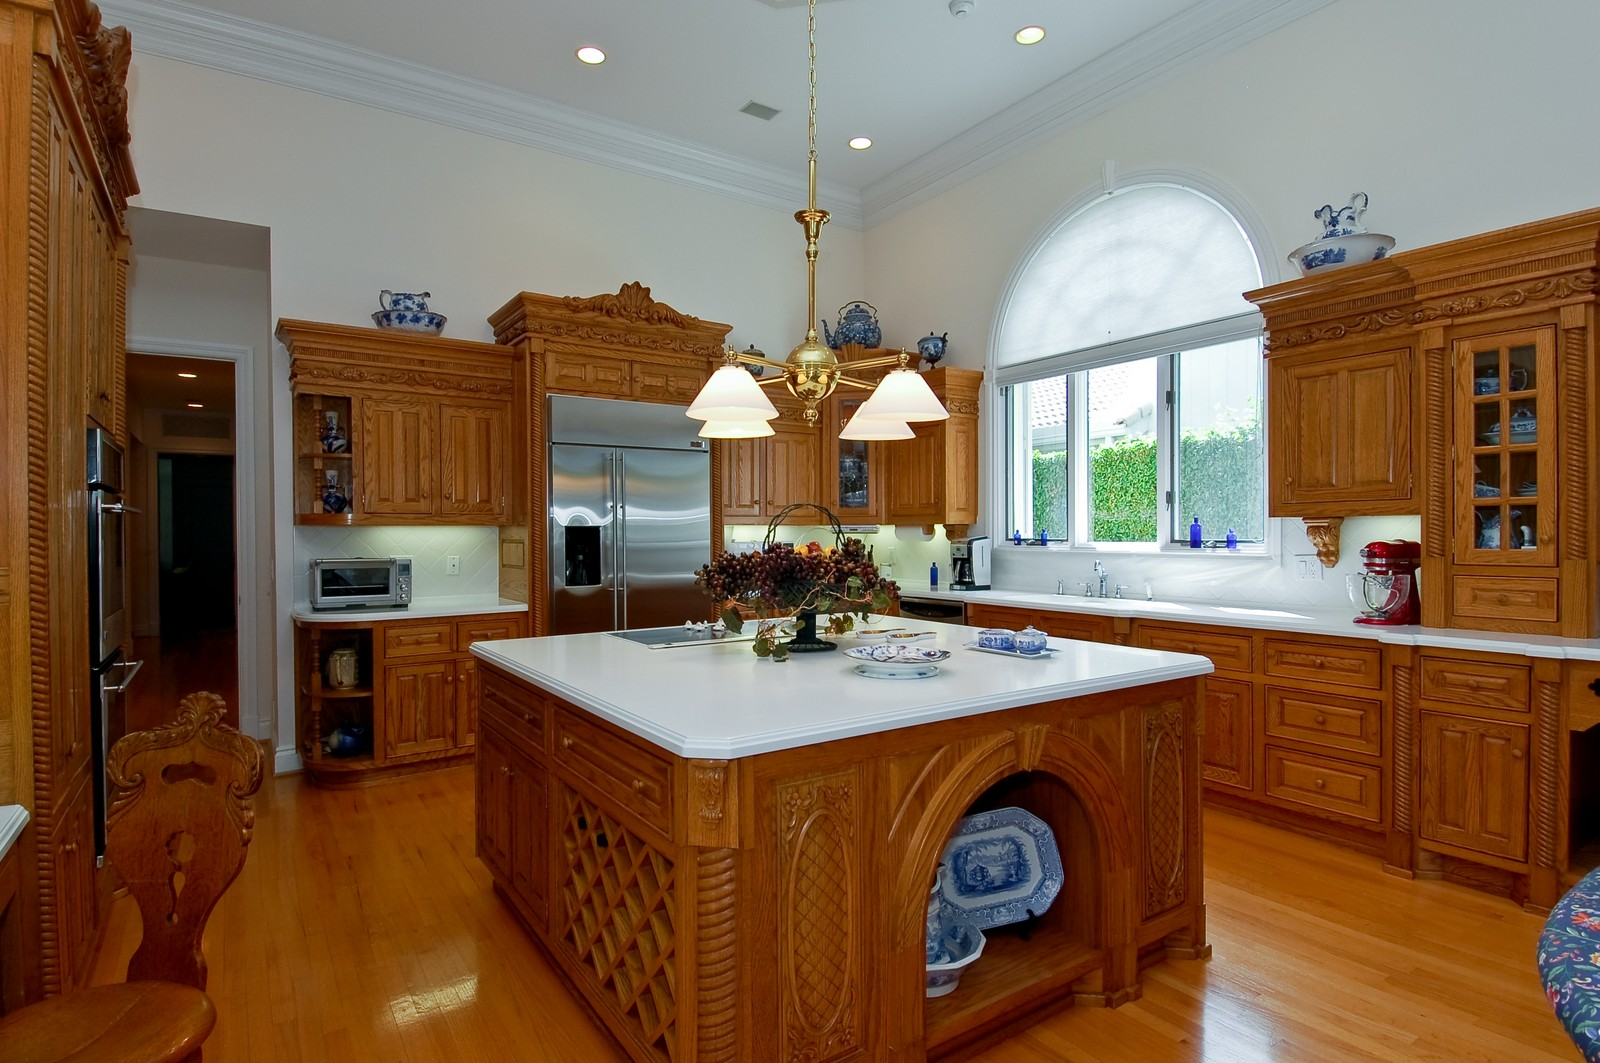 Real Estate Photography - 4252 Bocaire Blvd, Boca Raton, FL, 33487 - Kitchen